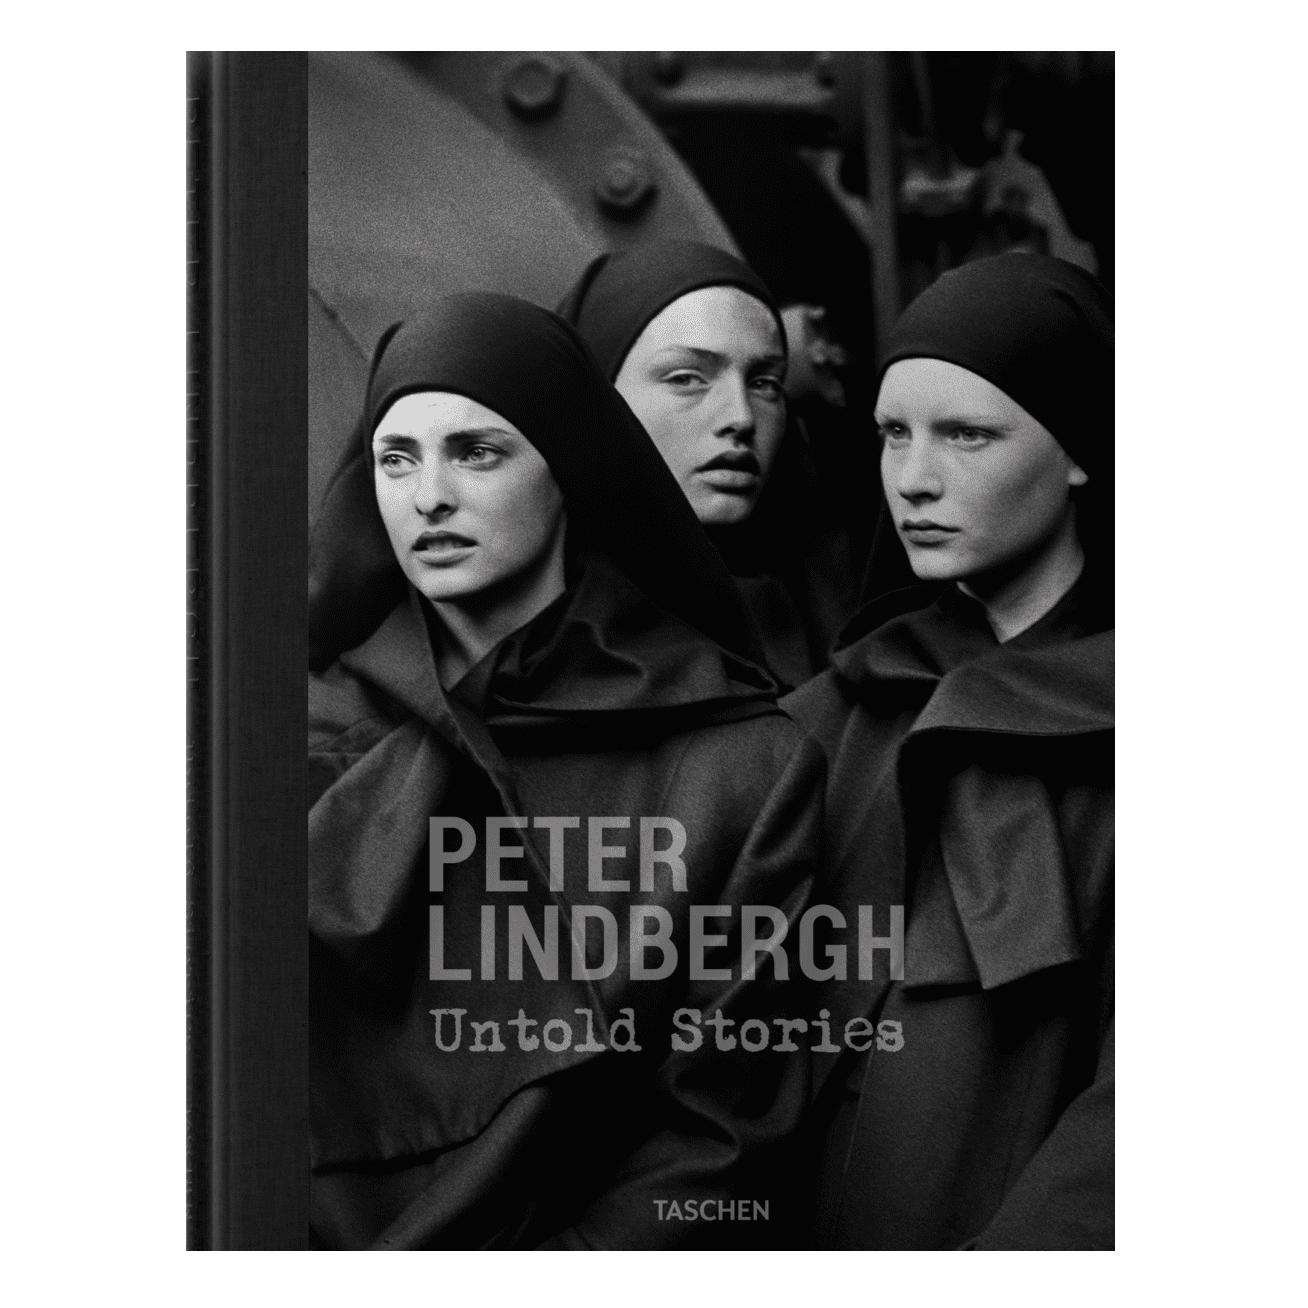 UNTOLD STORIES - PETER LINDBERGH